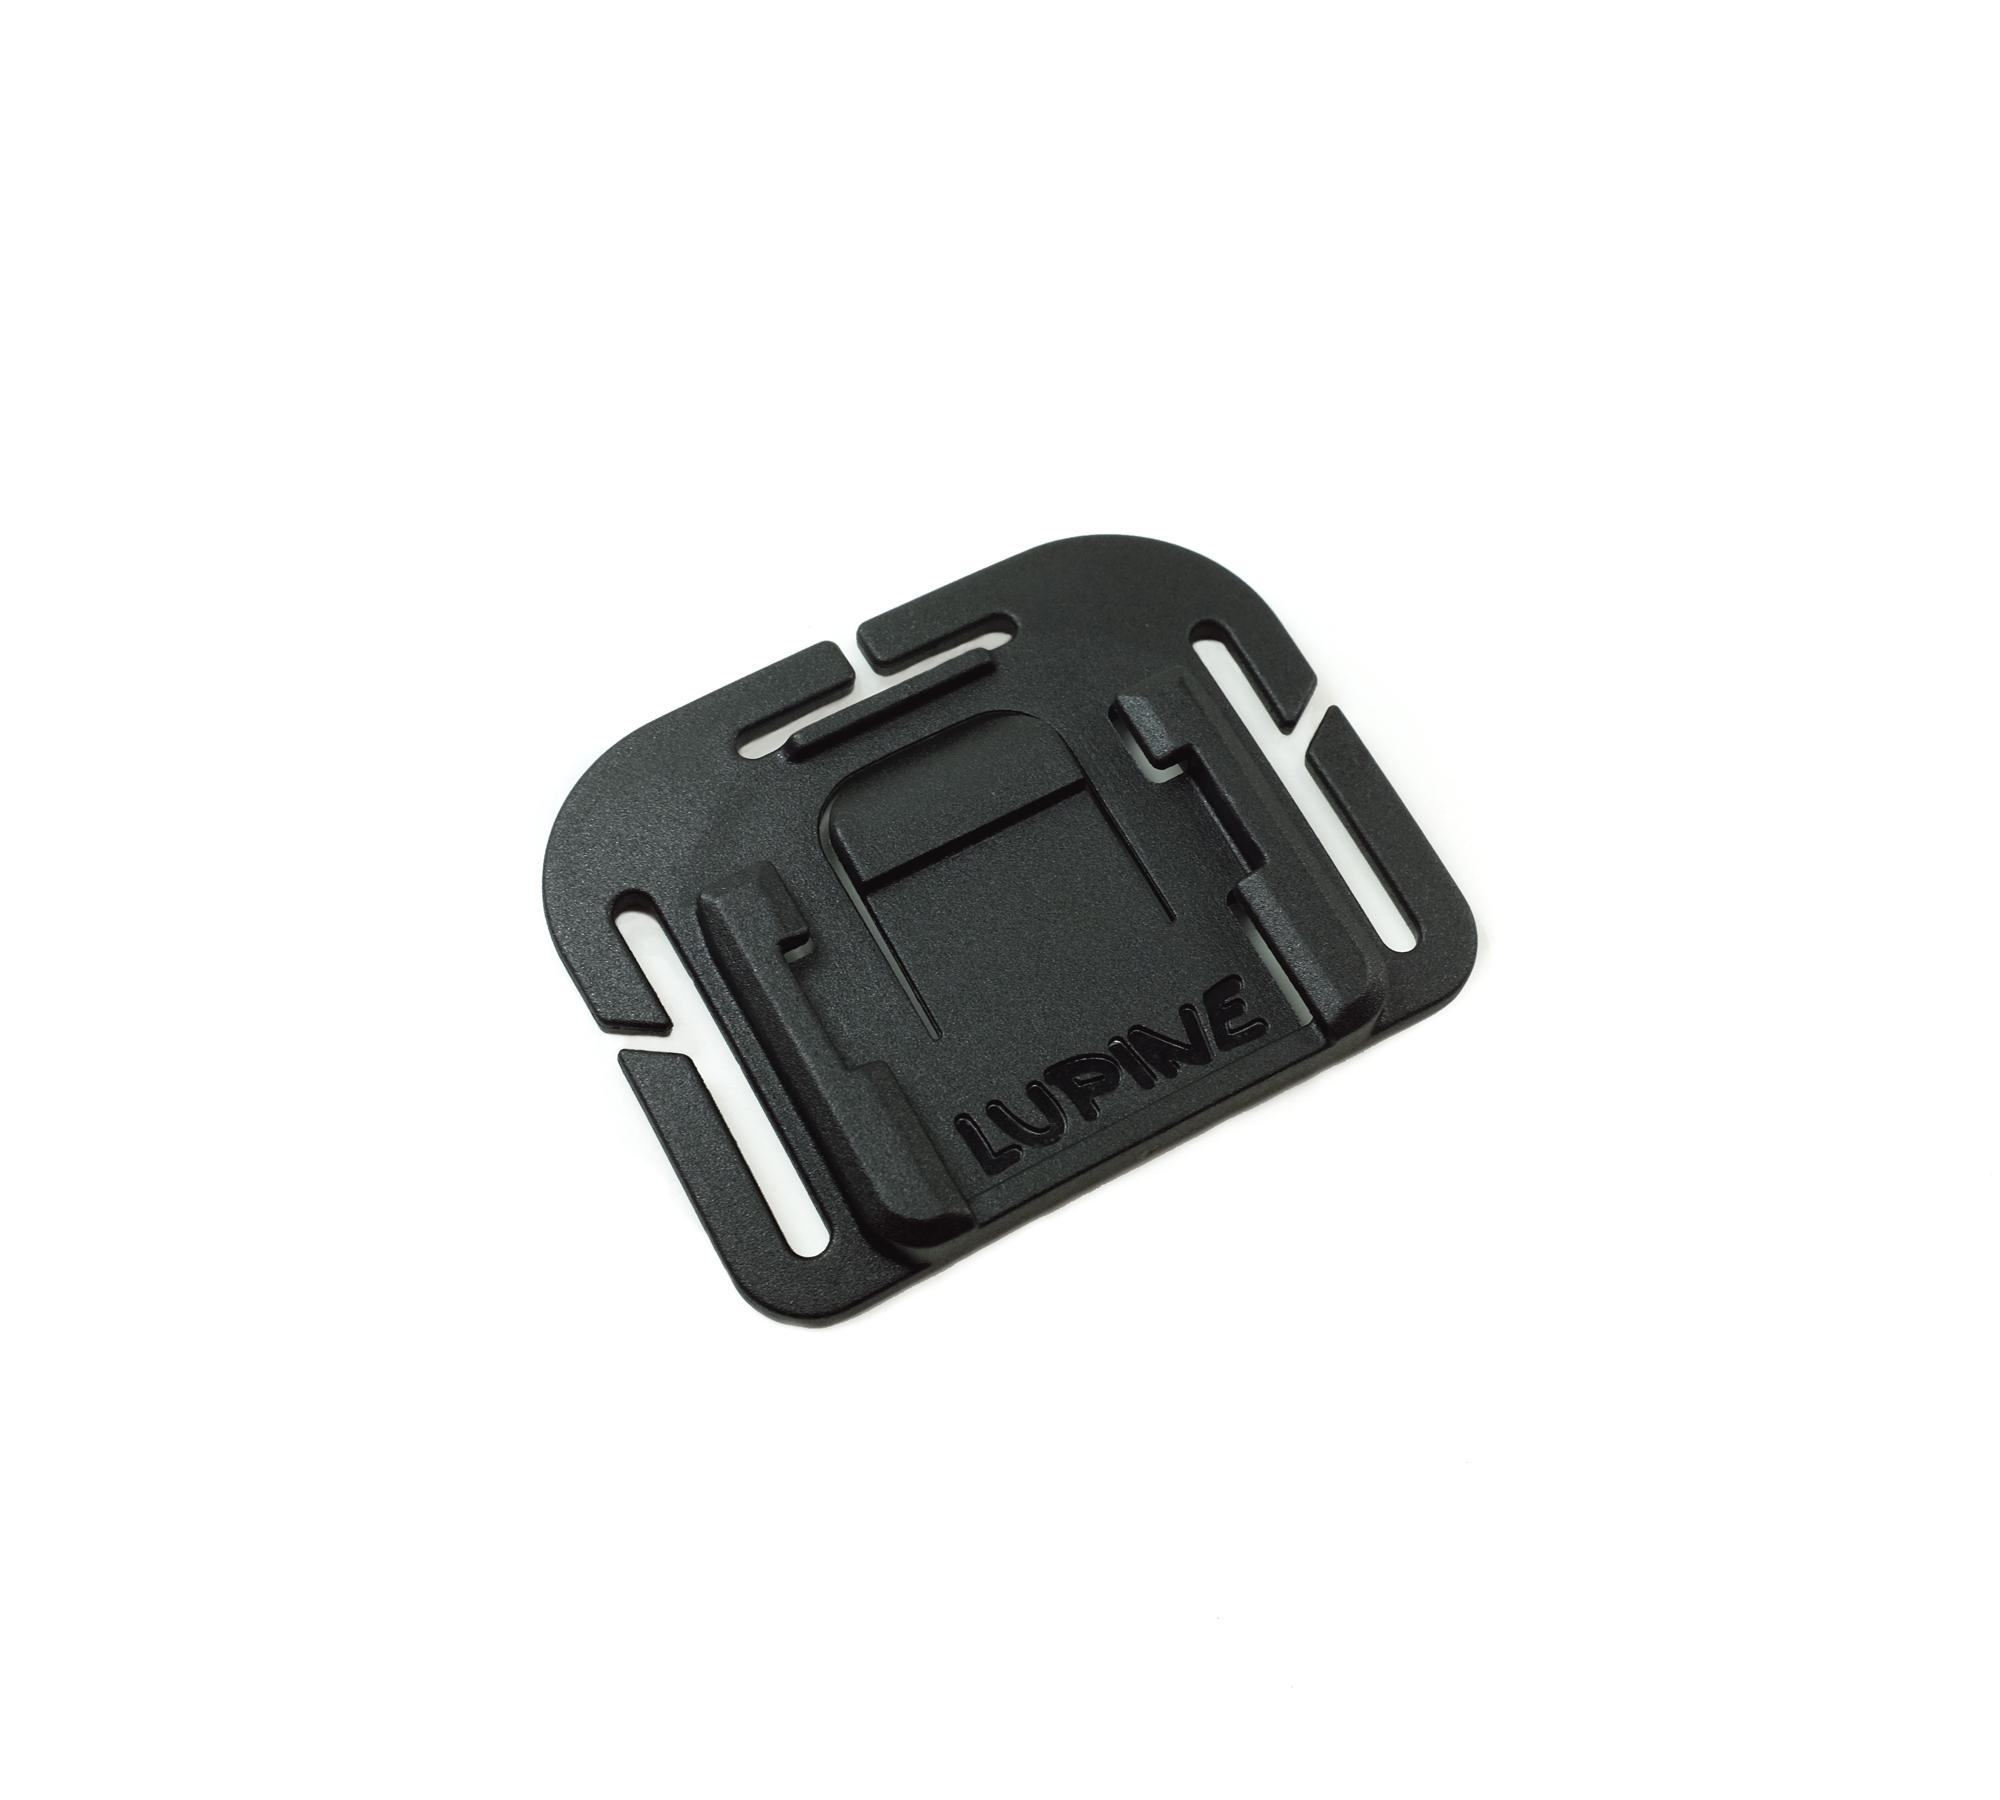 Platte FrontClick Stirnband (einzeln) Neo/Piko/Blika